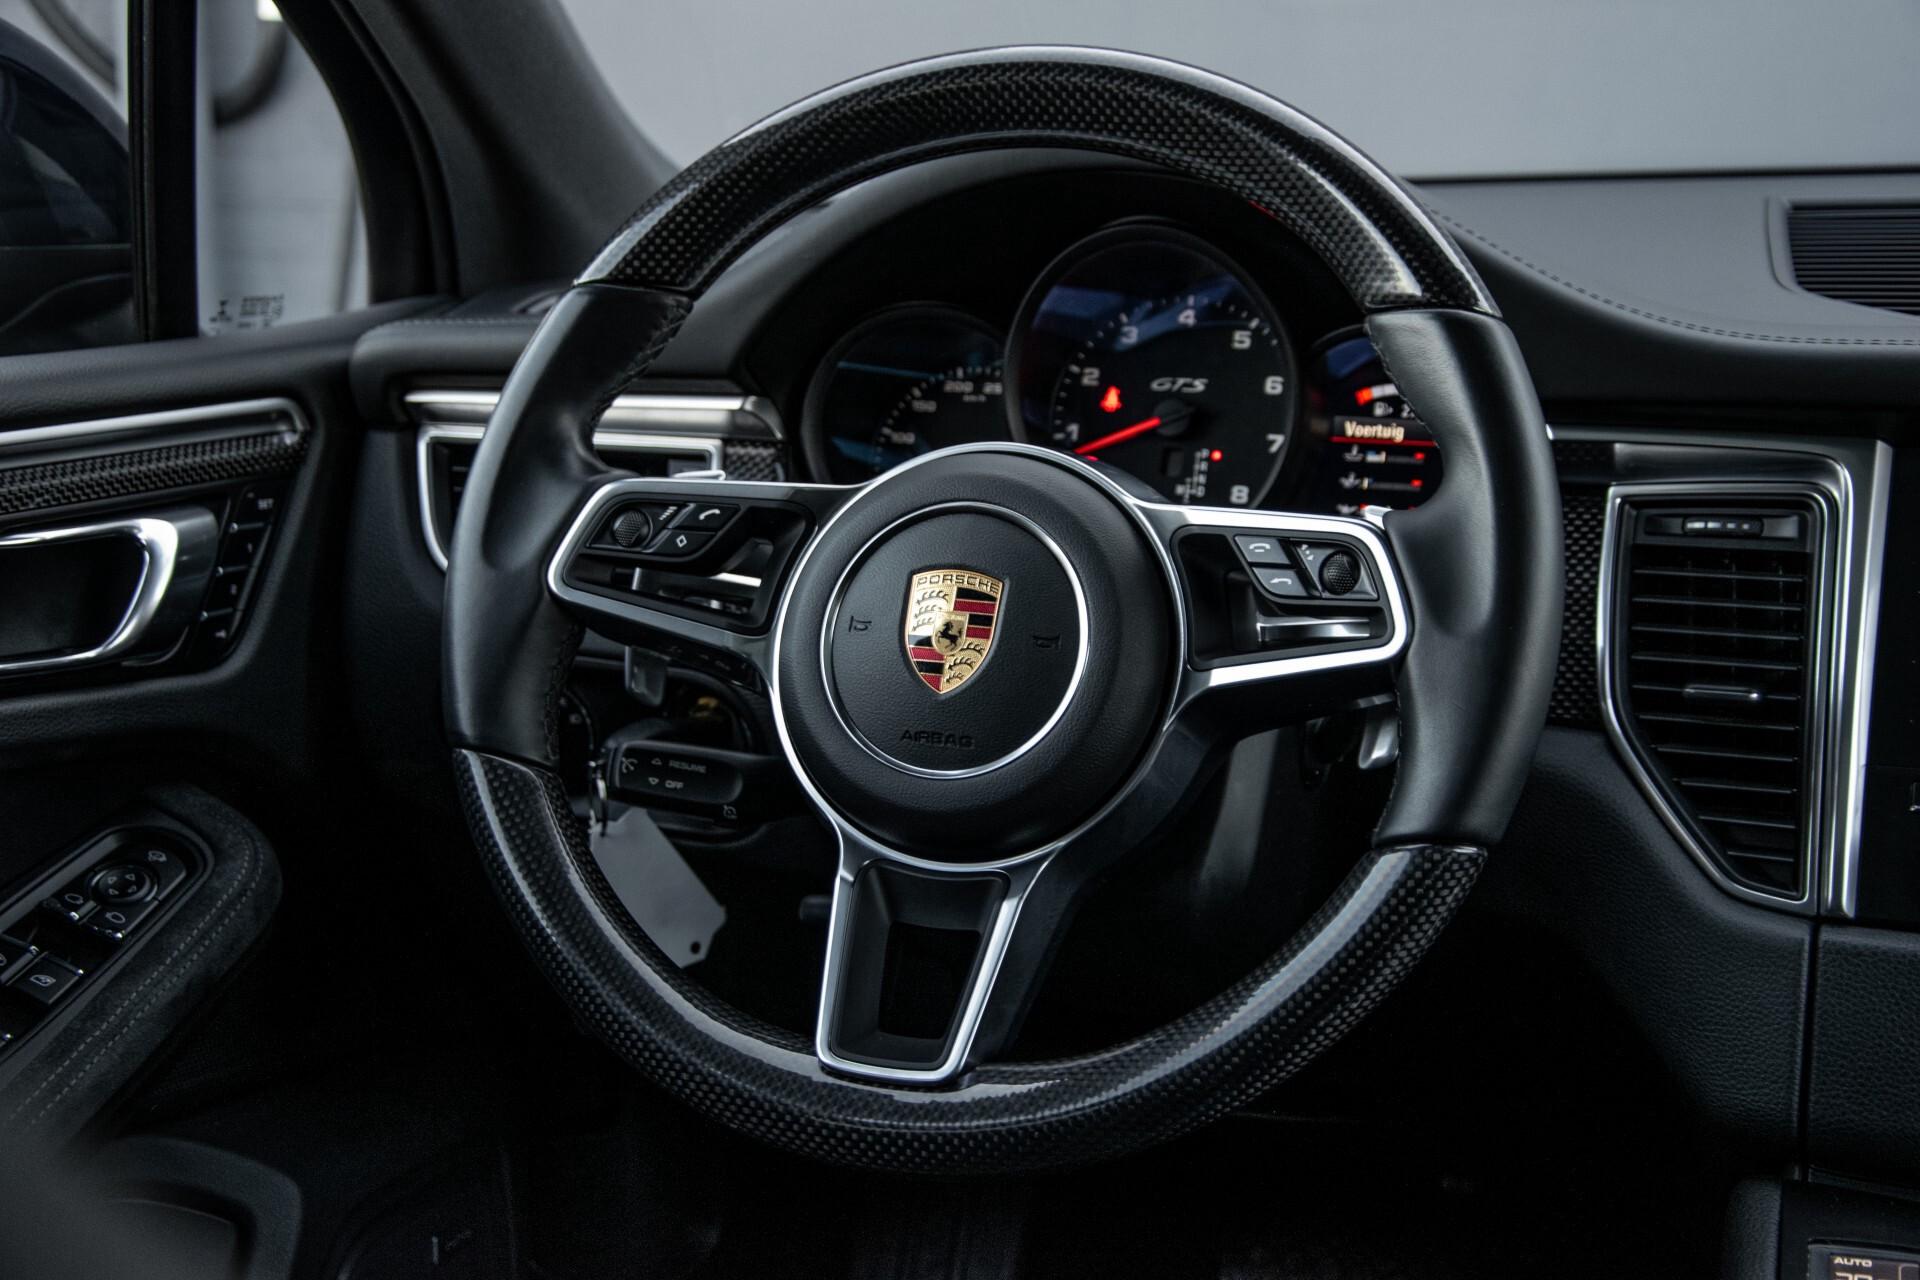 Porsche Macan 3.0 GTS Luchtvering/Panorama/Carbon/Bose/360-camera/Memory/PDLS Aut7 Foto 9